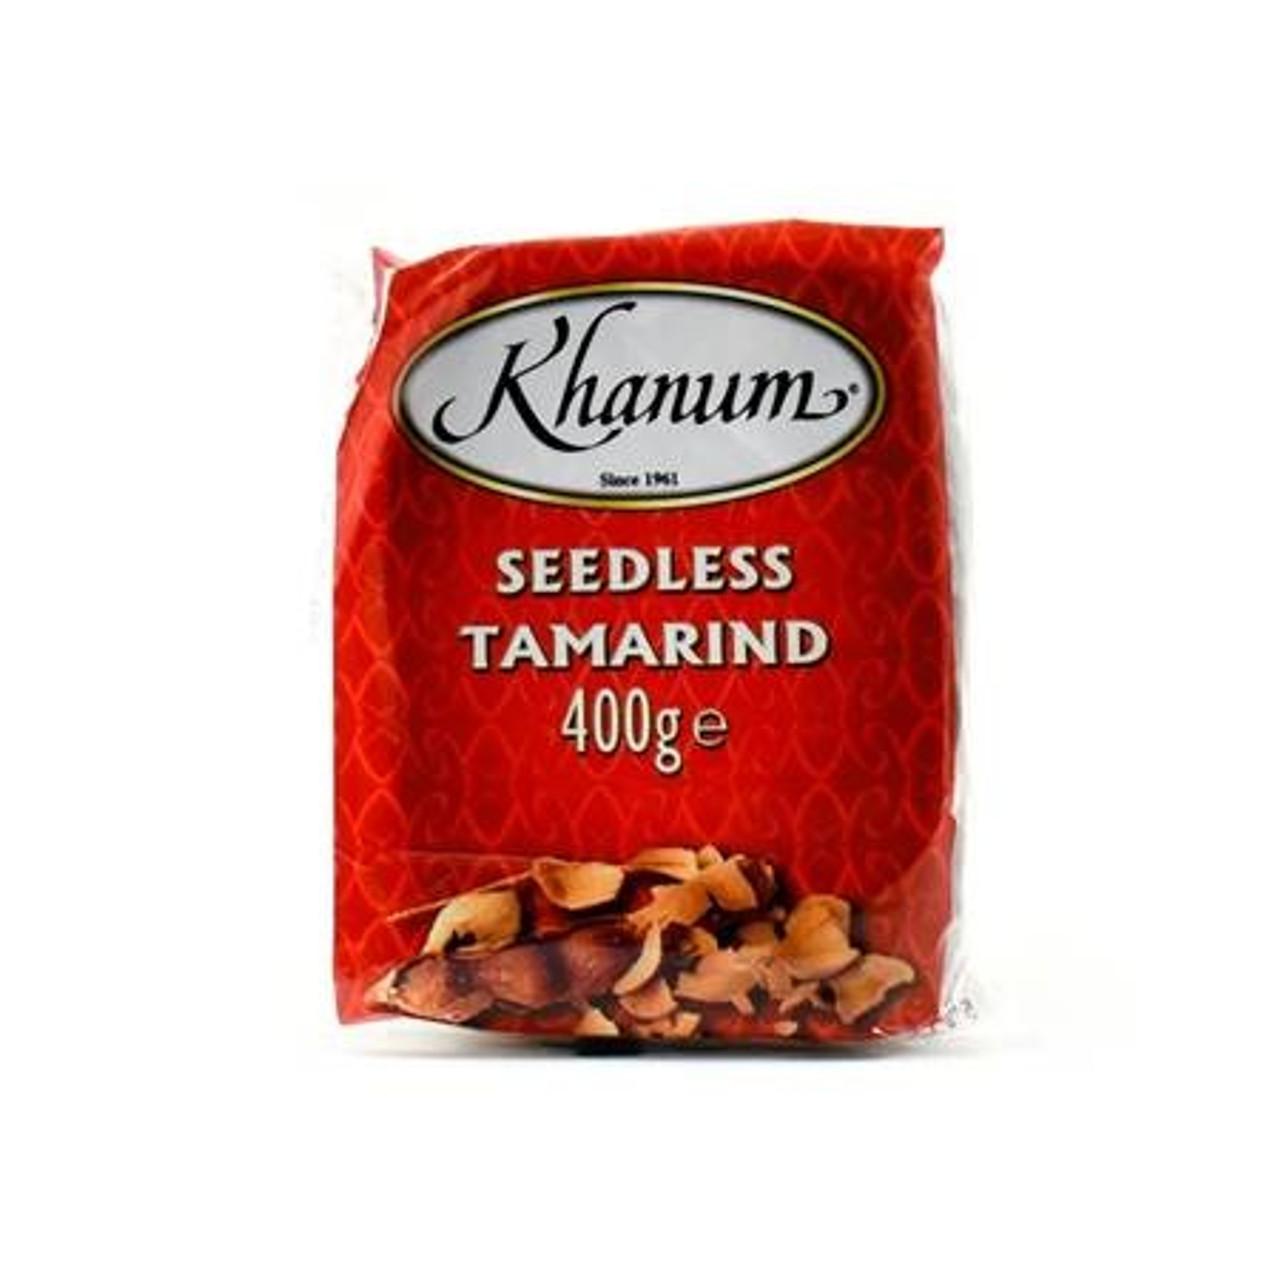 Khanum Seedless Tamarind 400g